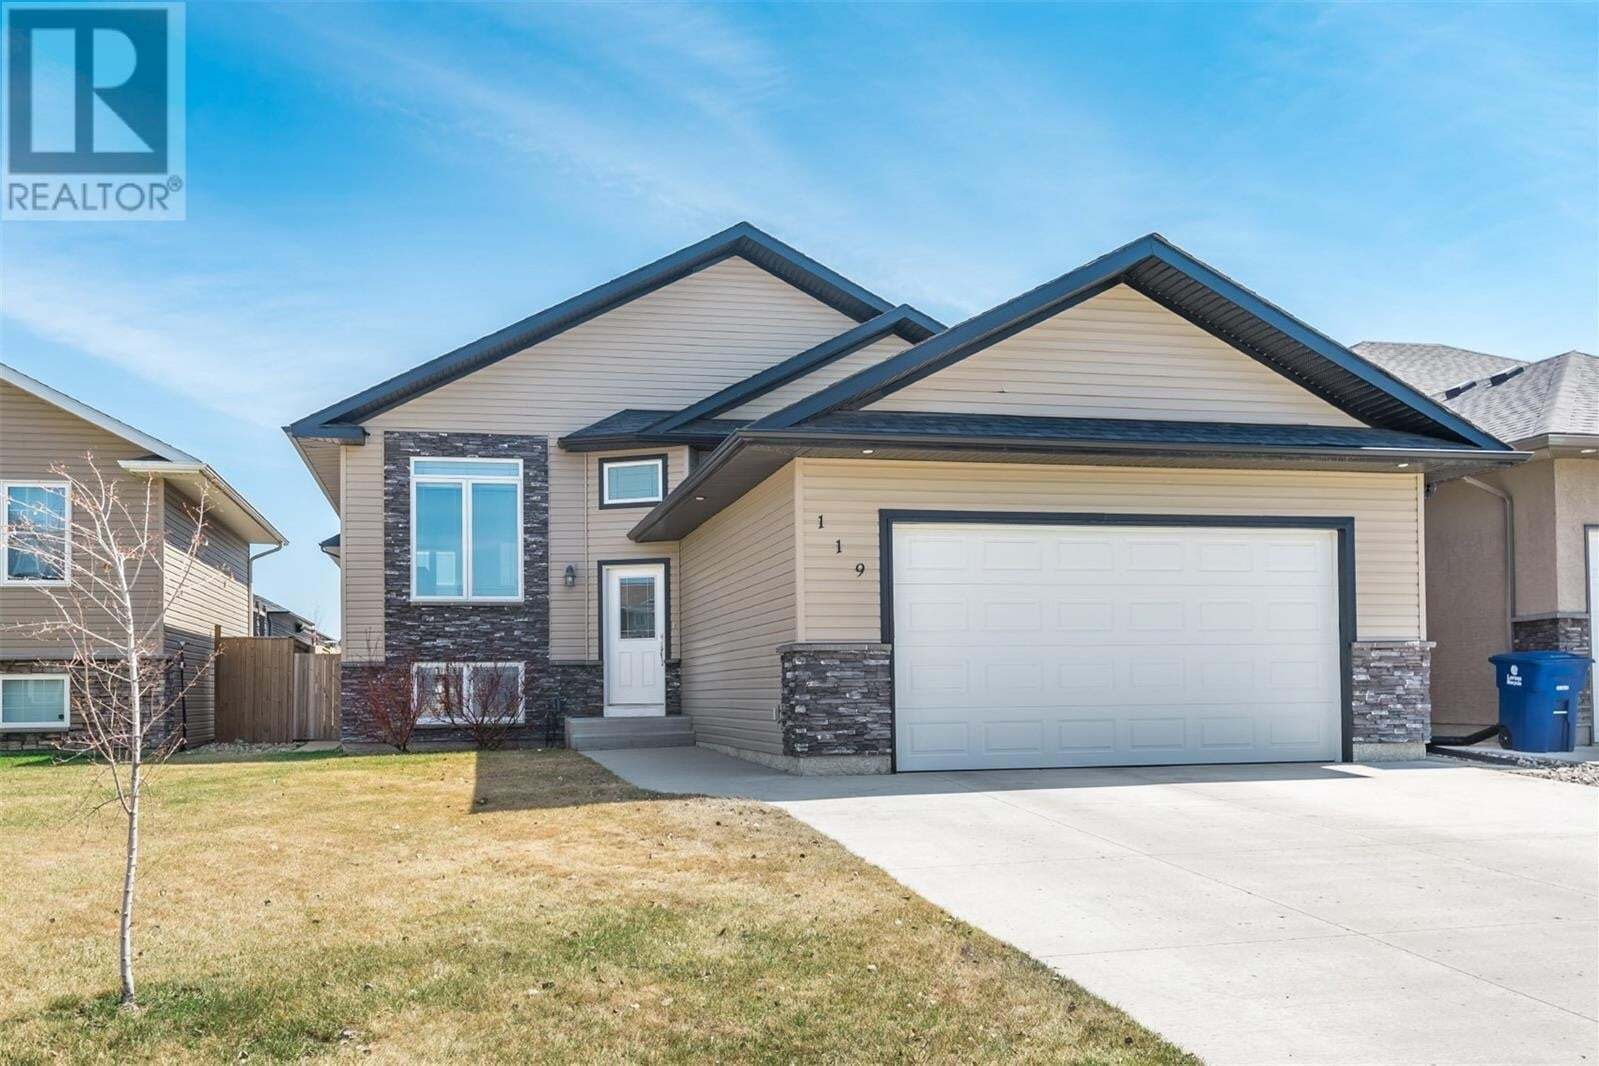 House for sale at 119 Atton Cres Saskatoon Saskatchewan - MLS: SK813909